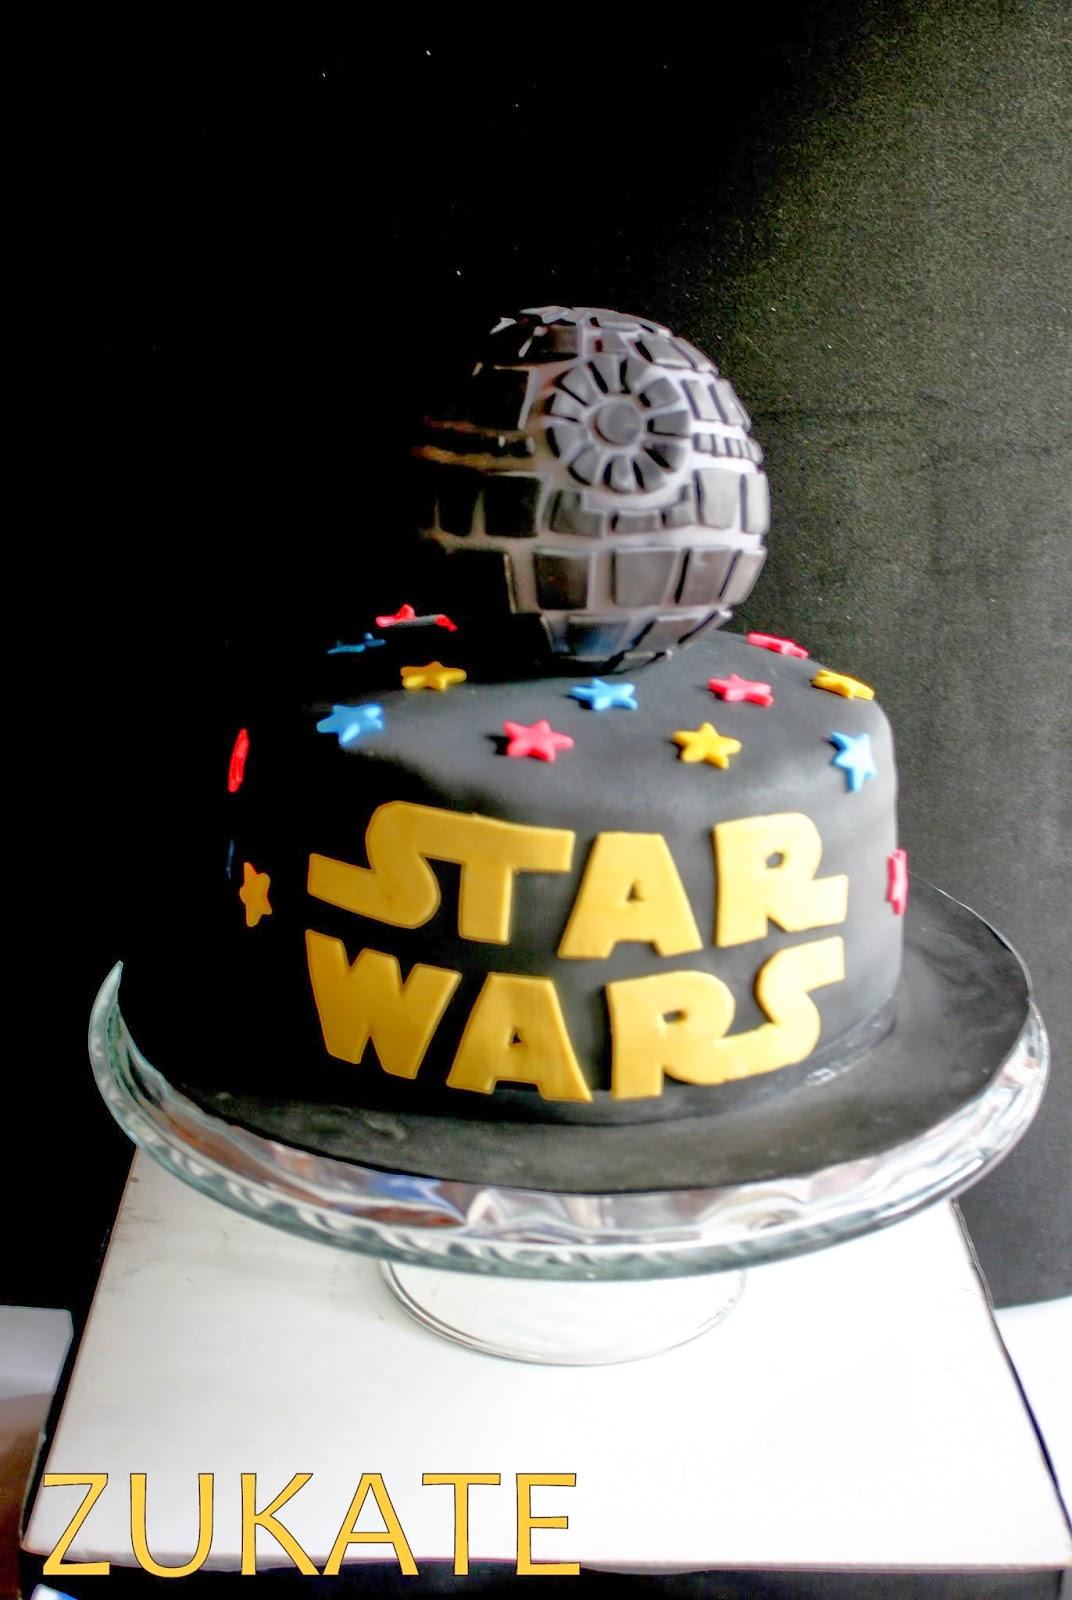 Amarillo Cake Wars